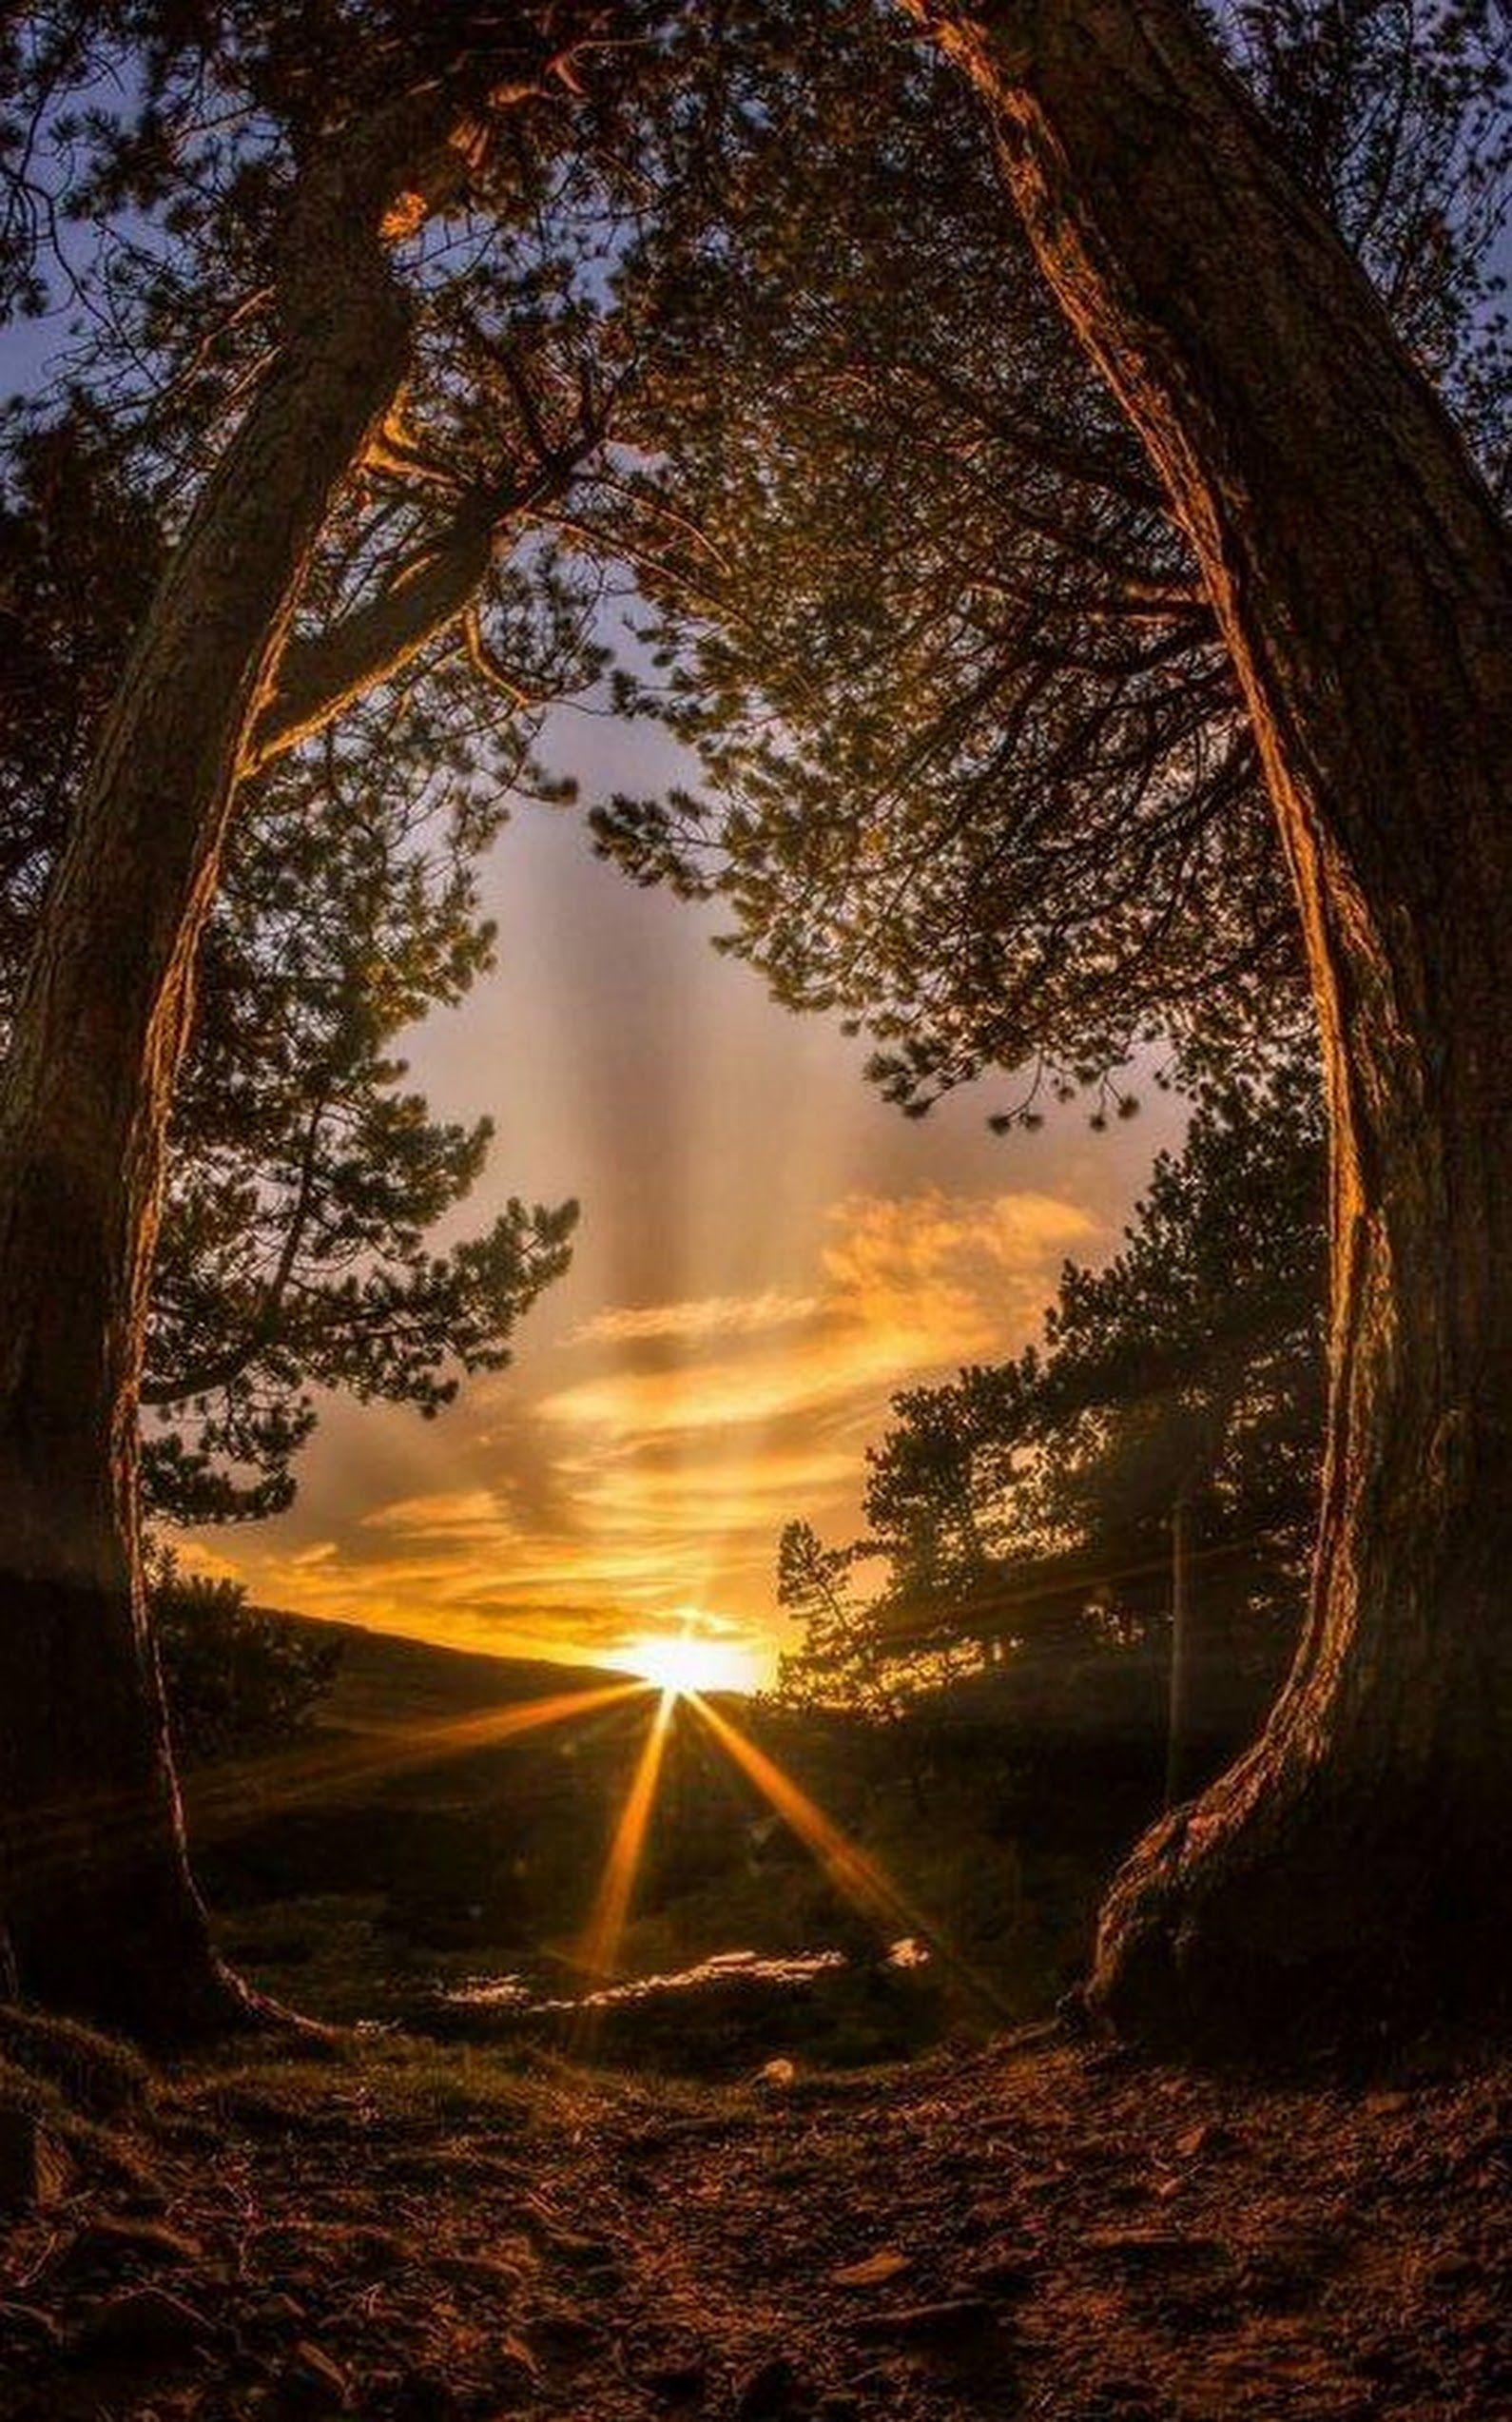 Good Morning Dear Friends Beautiful Nature ѕαναş ρσlαт Google